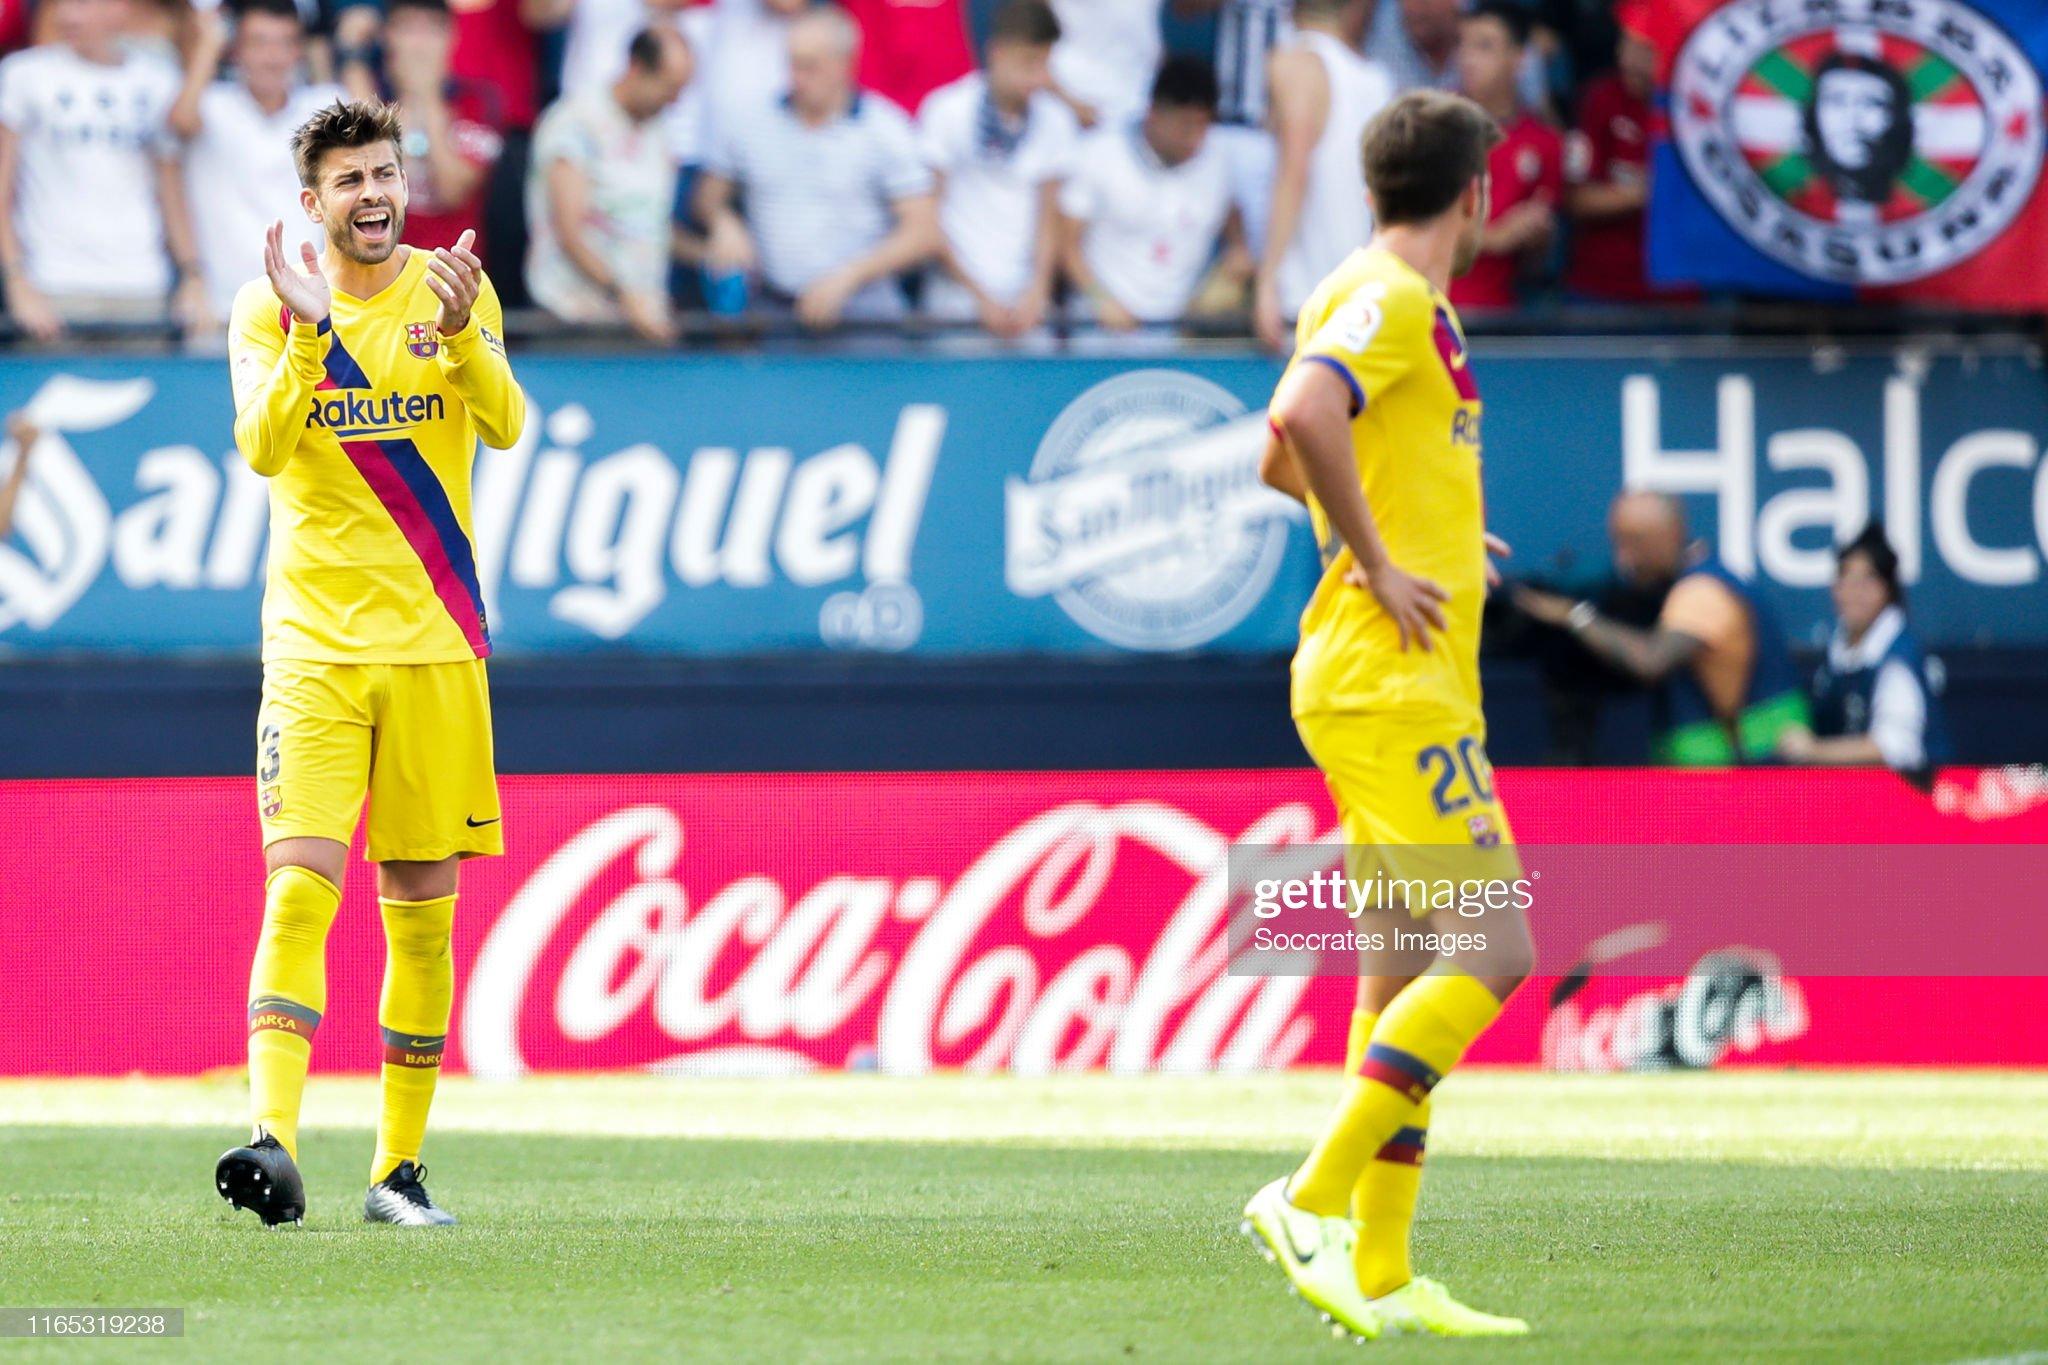 صور مباراة : أوساسونا - برشلونة 2-2 ( 31-08-2019 )  Gerard-pique-of-fc-barcelona-during-the-la-liga-santander-match-v-picture-id1165319238?s=2048x2048